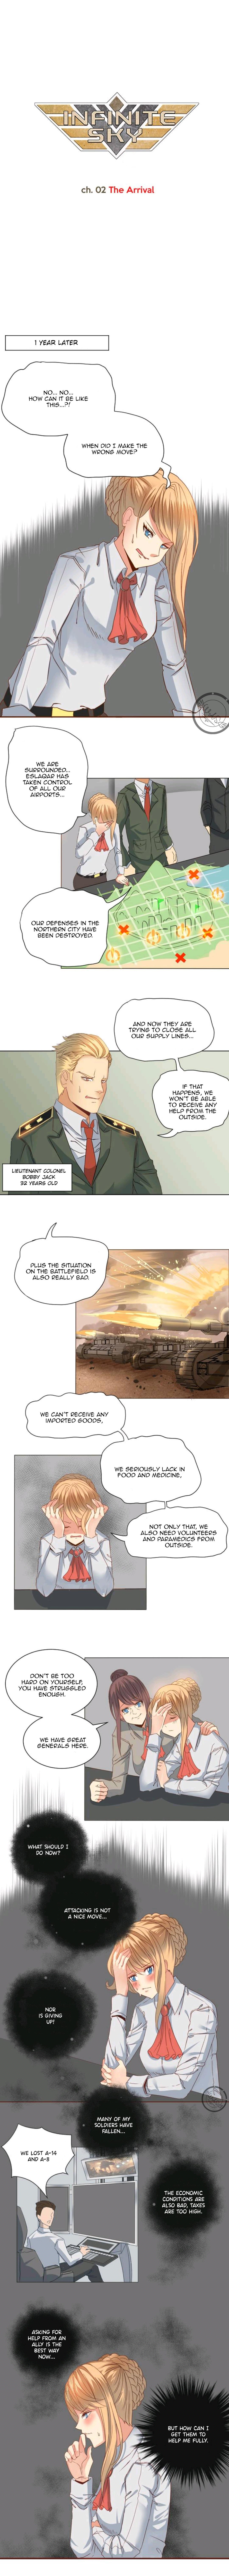 https://img2.nineanime.com/comics/pic2/17/29265/777960/92276dd8621cd0ab9e93f1e90eb80a2e.jpg Page 1